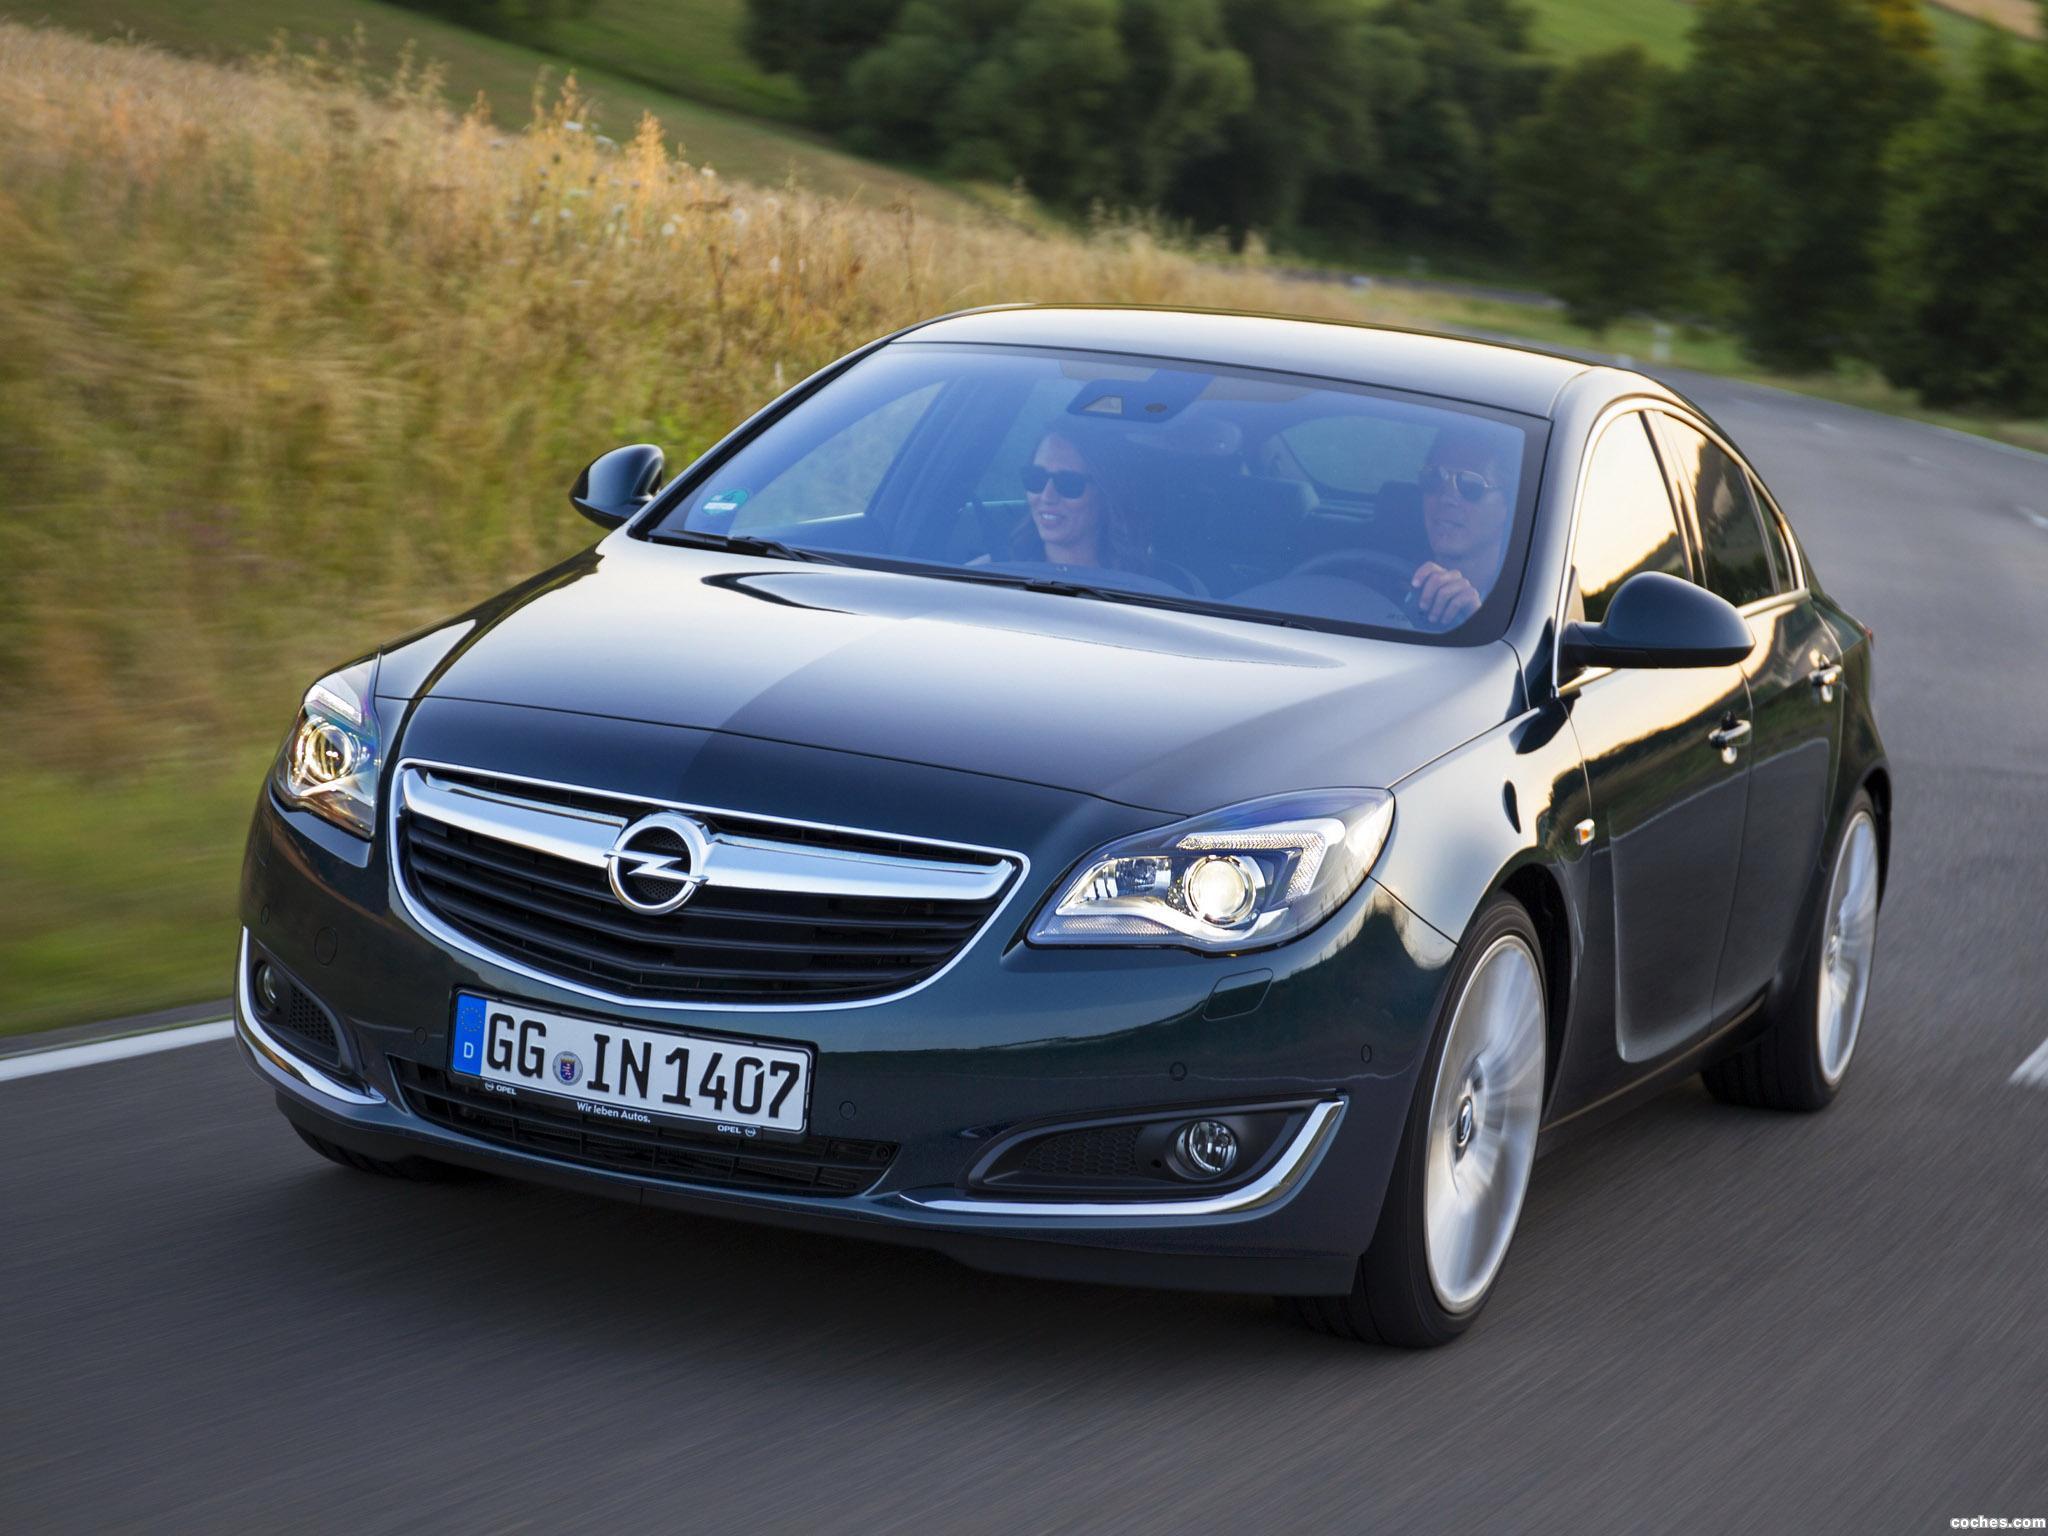 Foto 0 de Opel Insignia Hatchback 2013